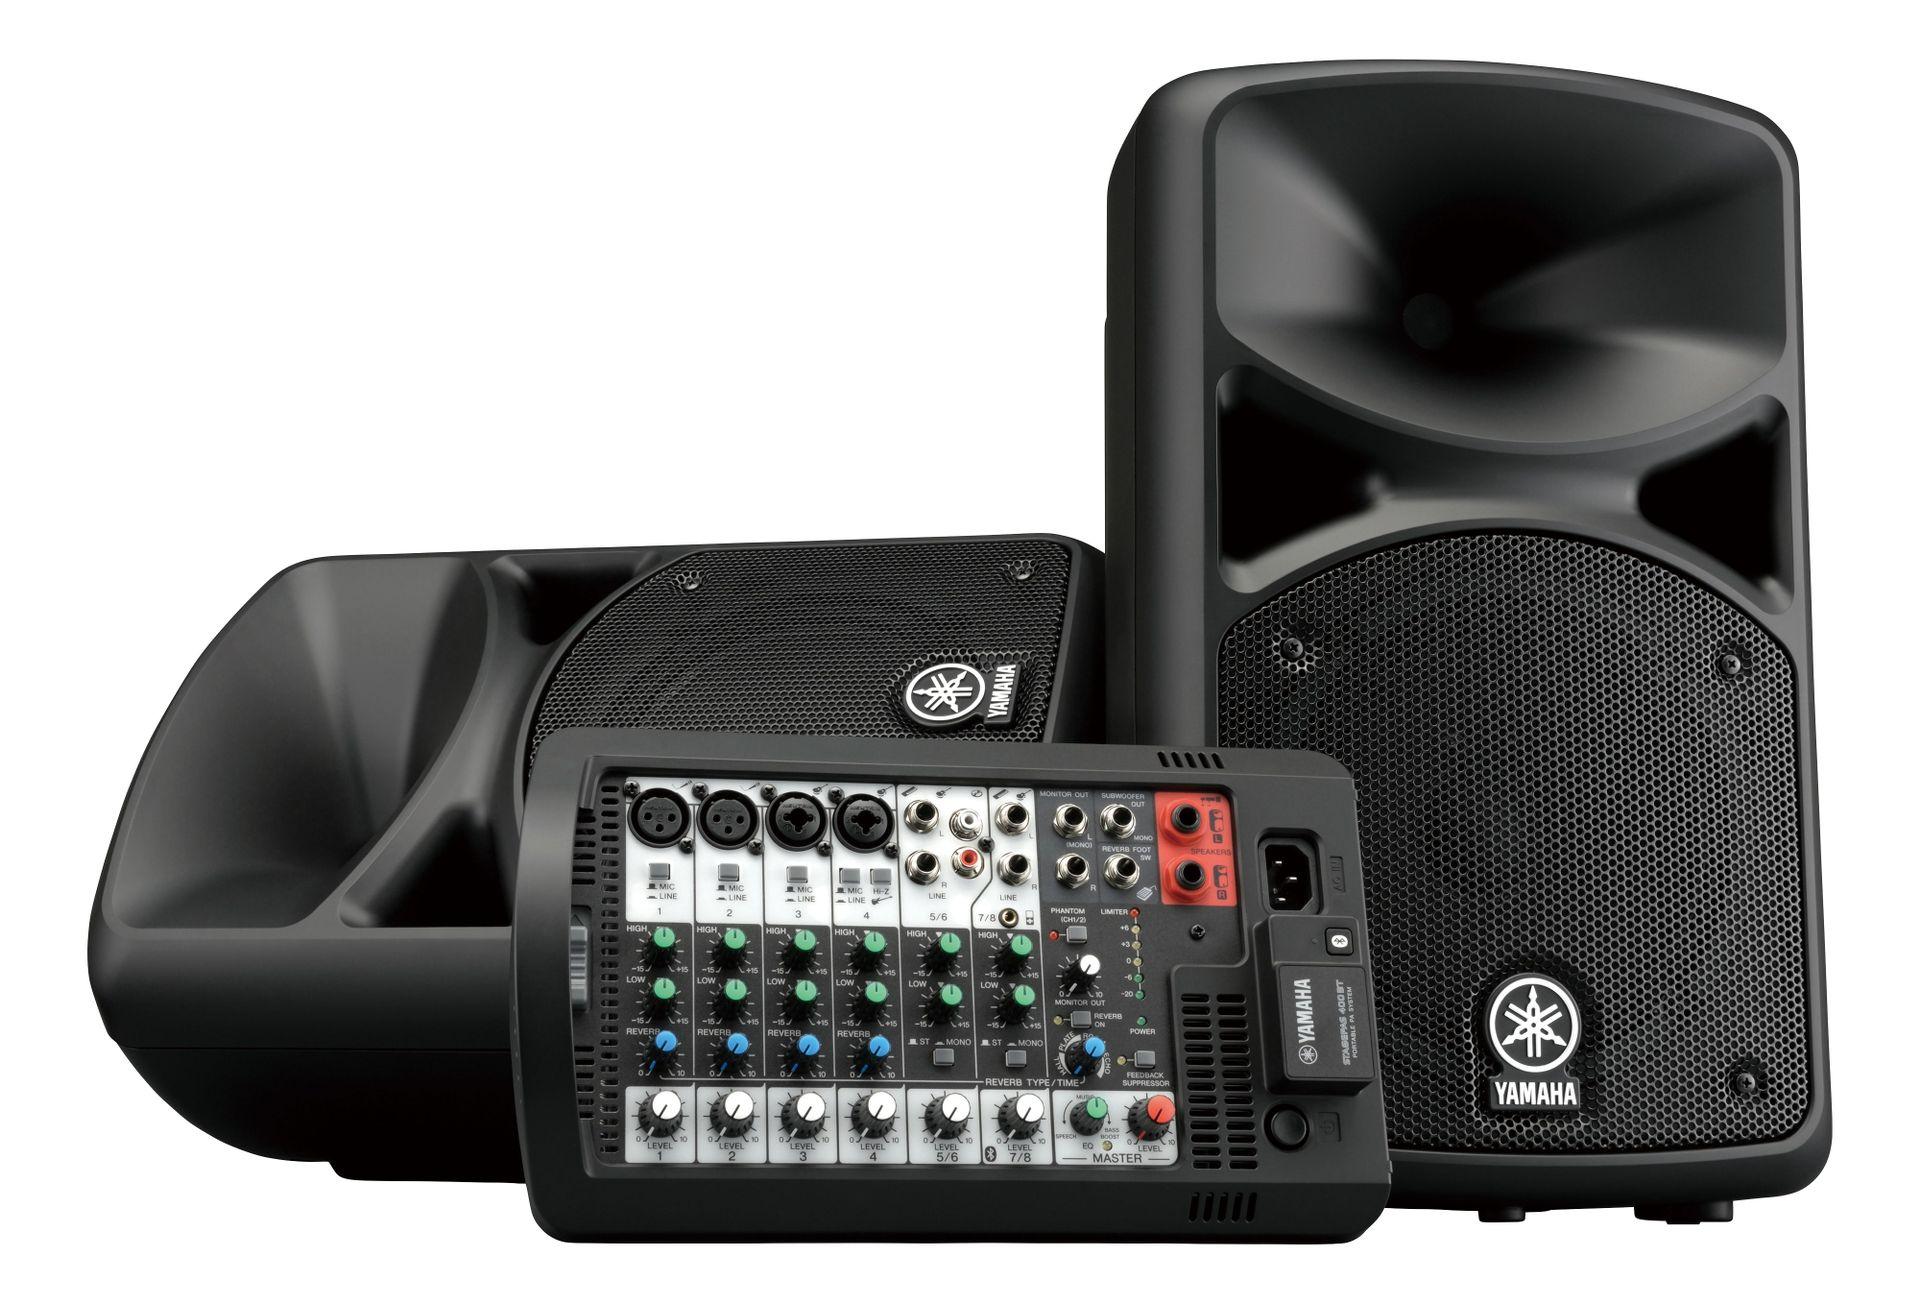 Yamaha Stagepas 400BT Klein-PA, integrierter Powermixer mit Bluetooth